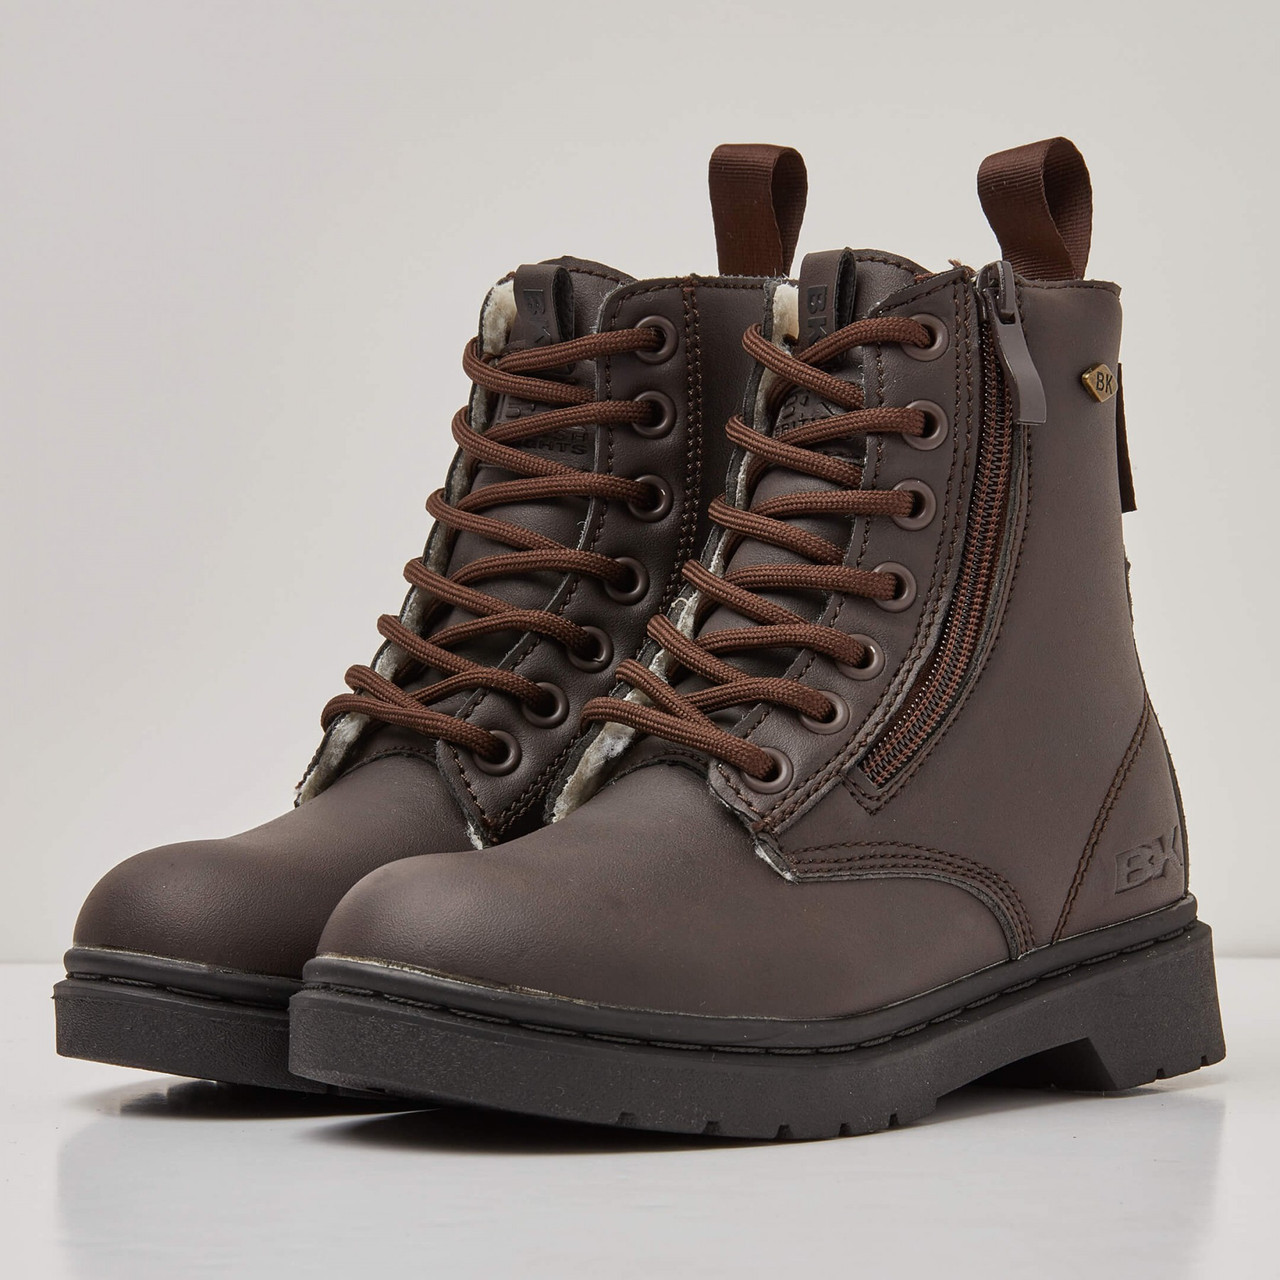 Ботинки для девочки British Knights Размер - 35 (22,5 см)